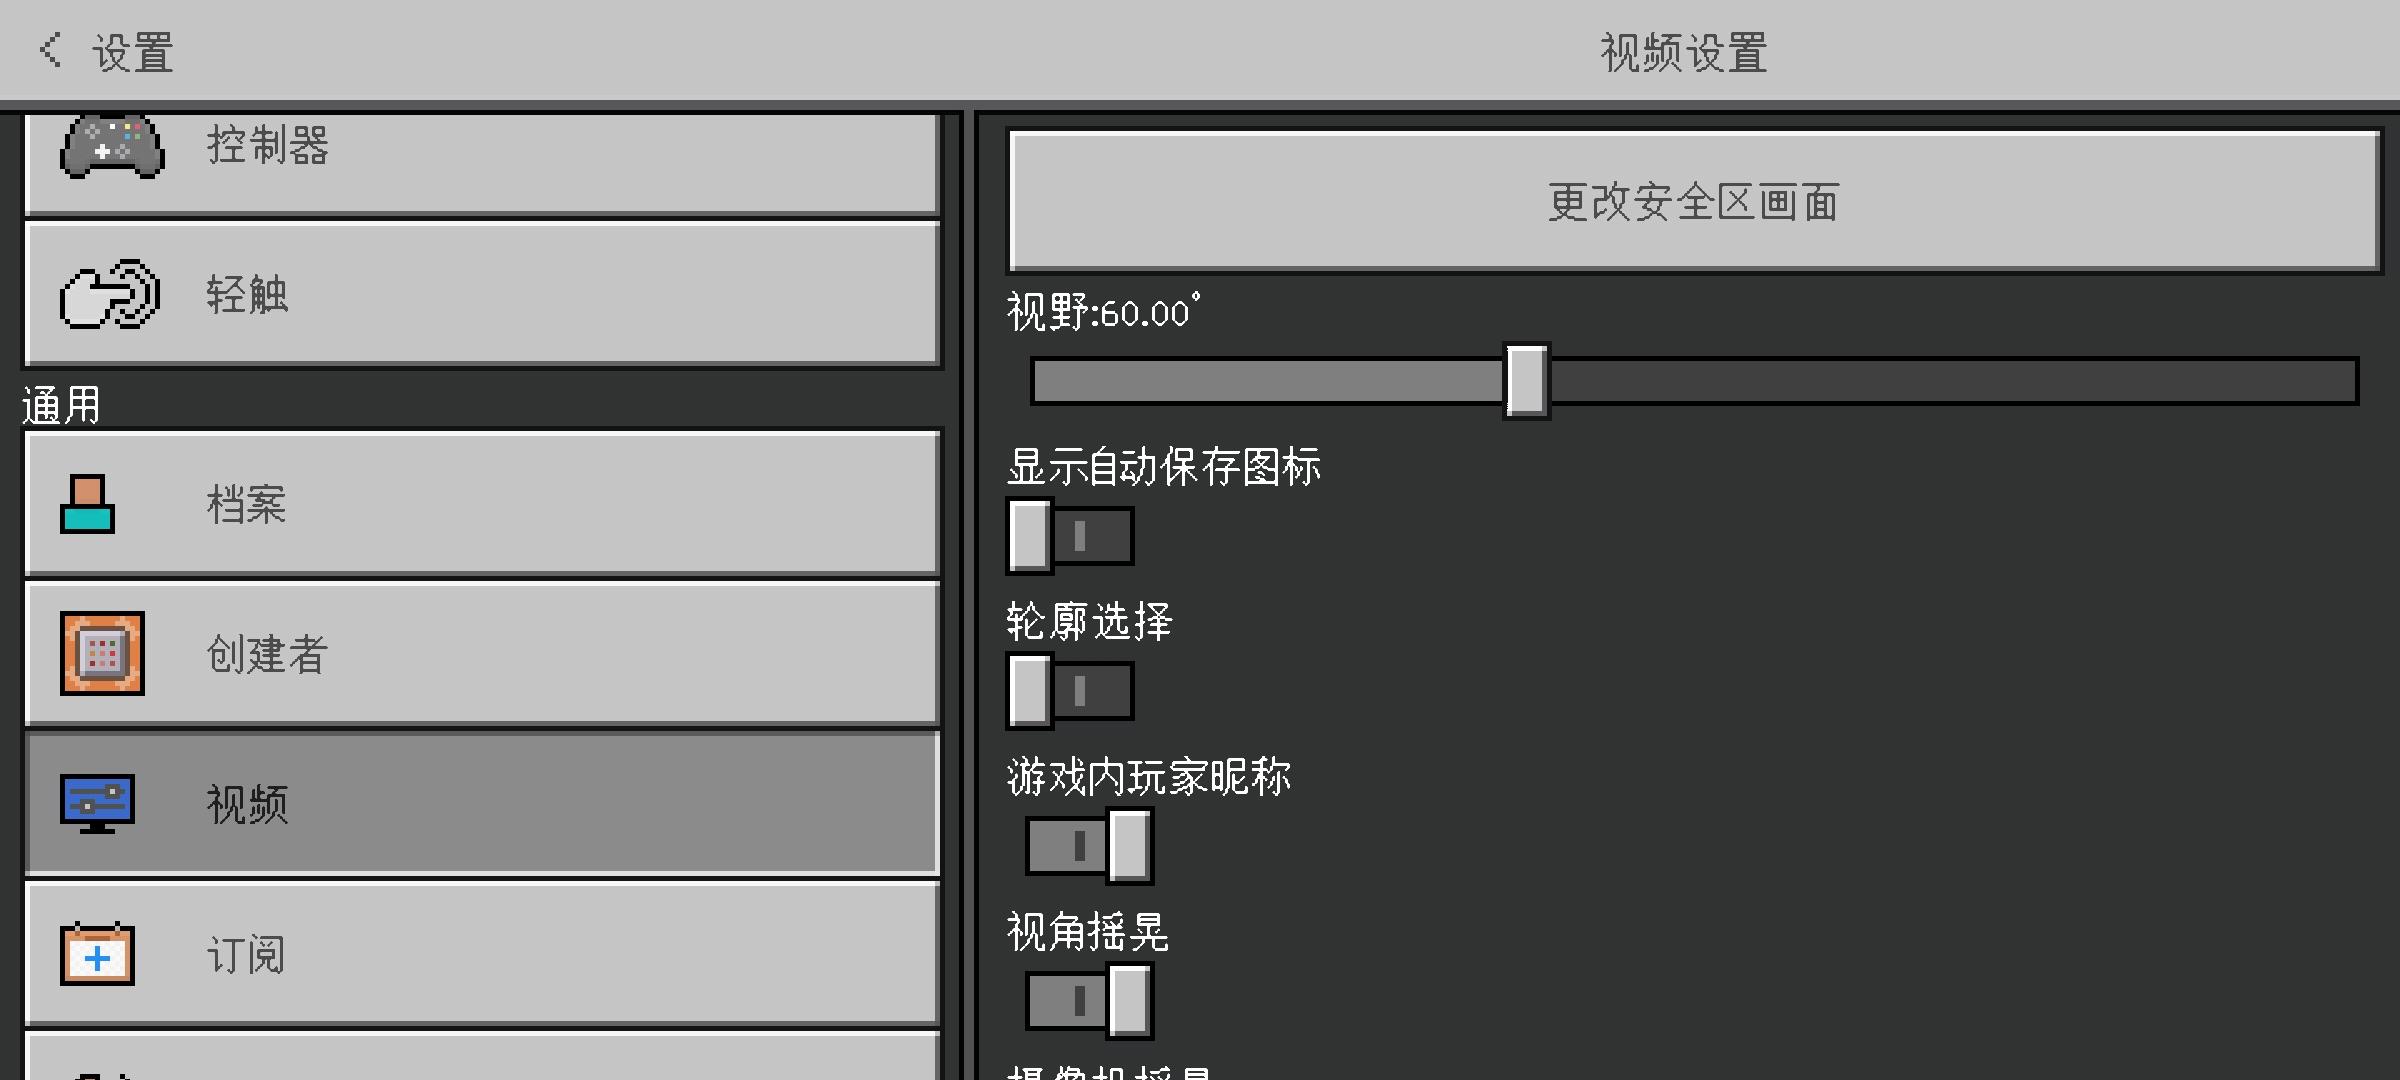 Screenshot_2021-06-22-21-13-26-763_com.mojang.minecraftpe.jpg